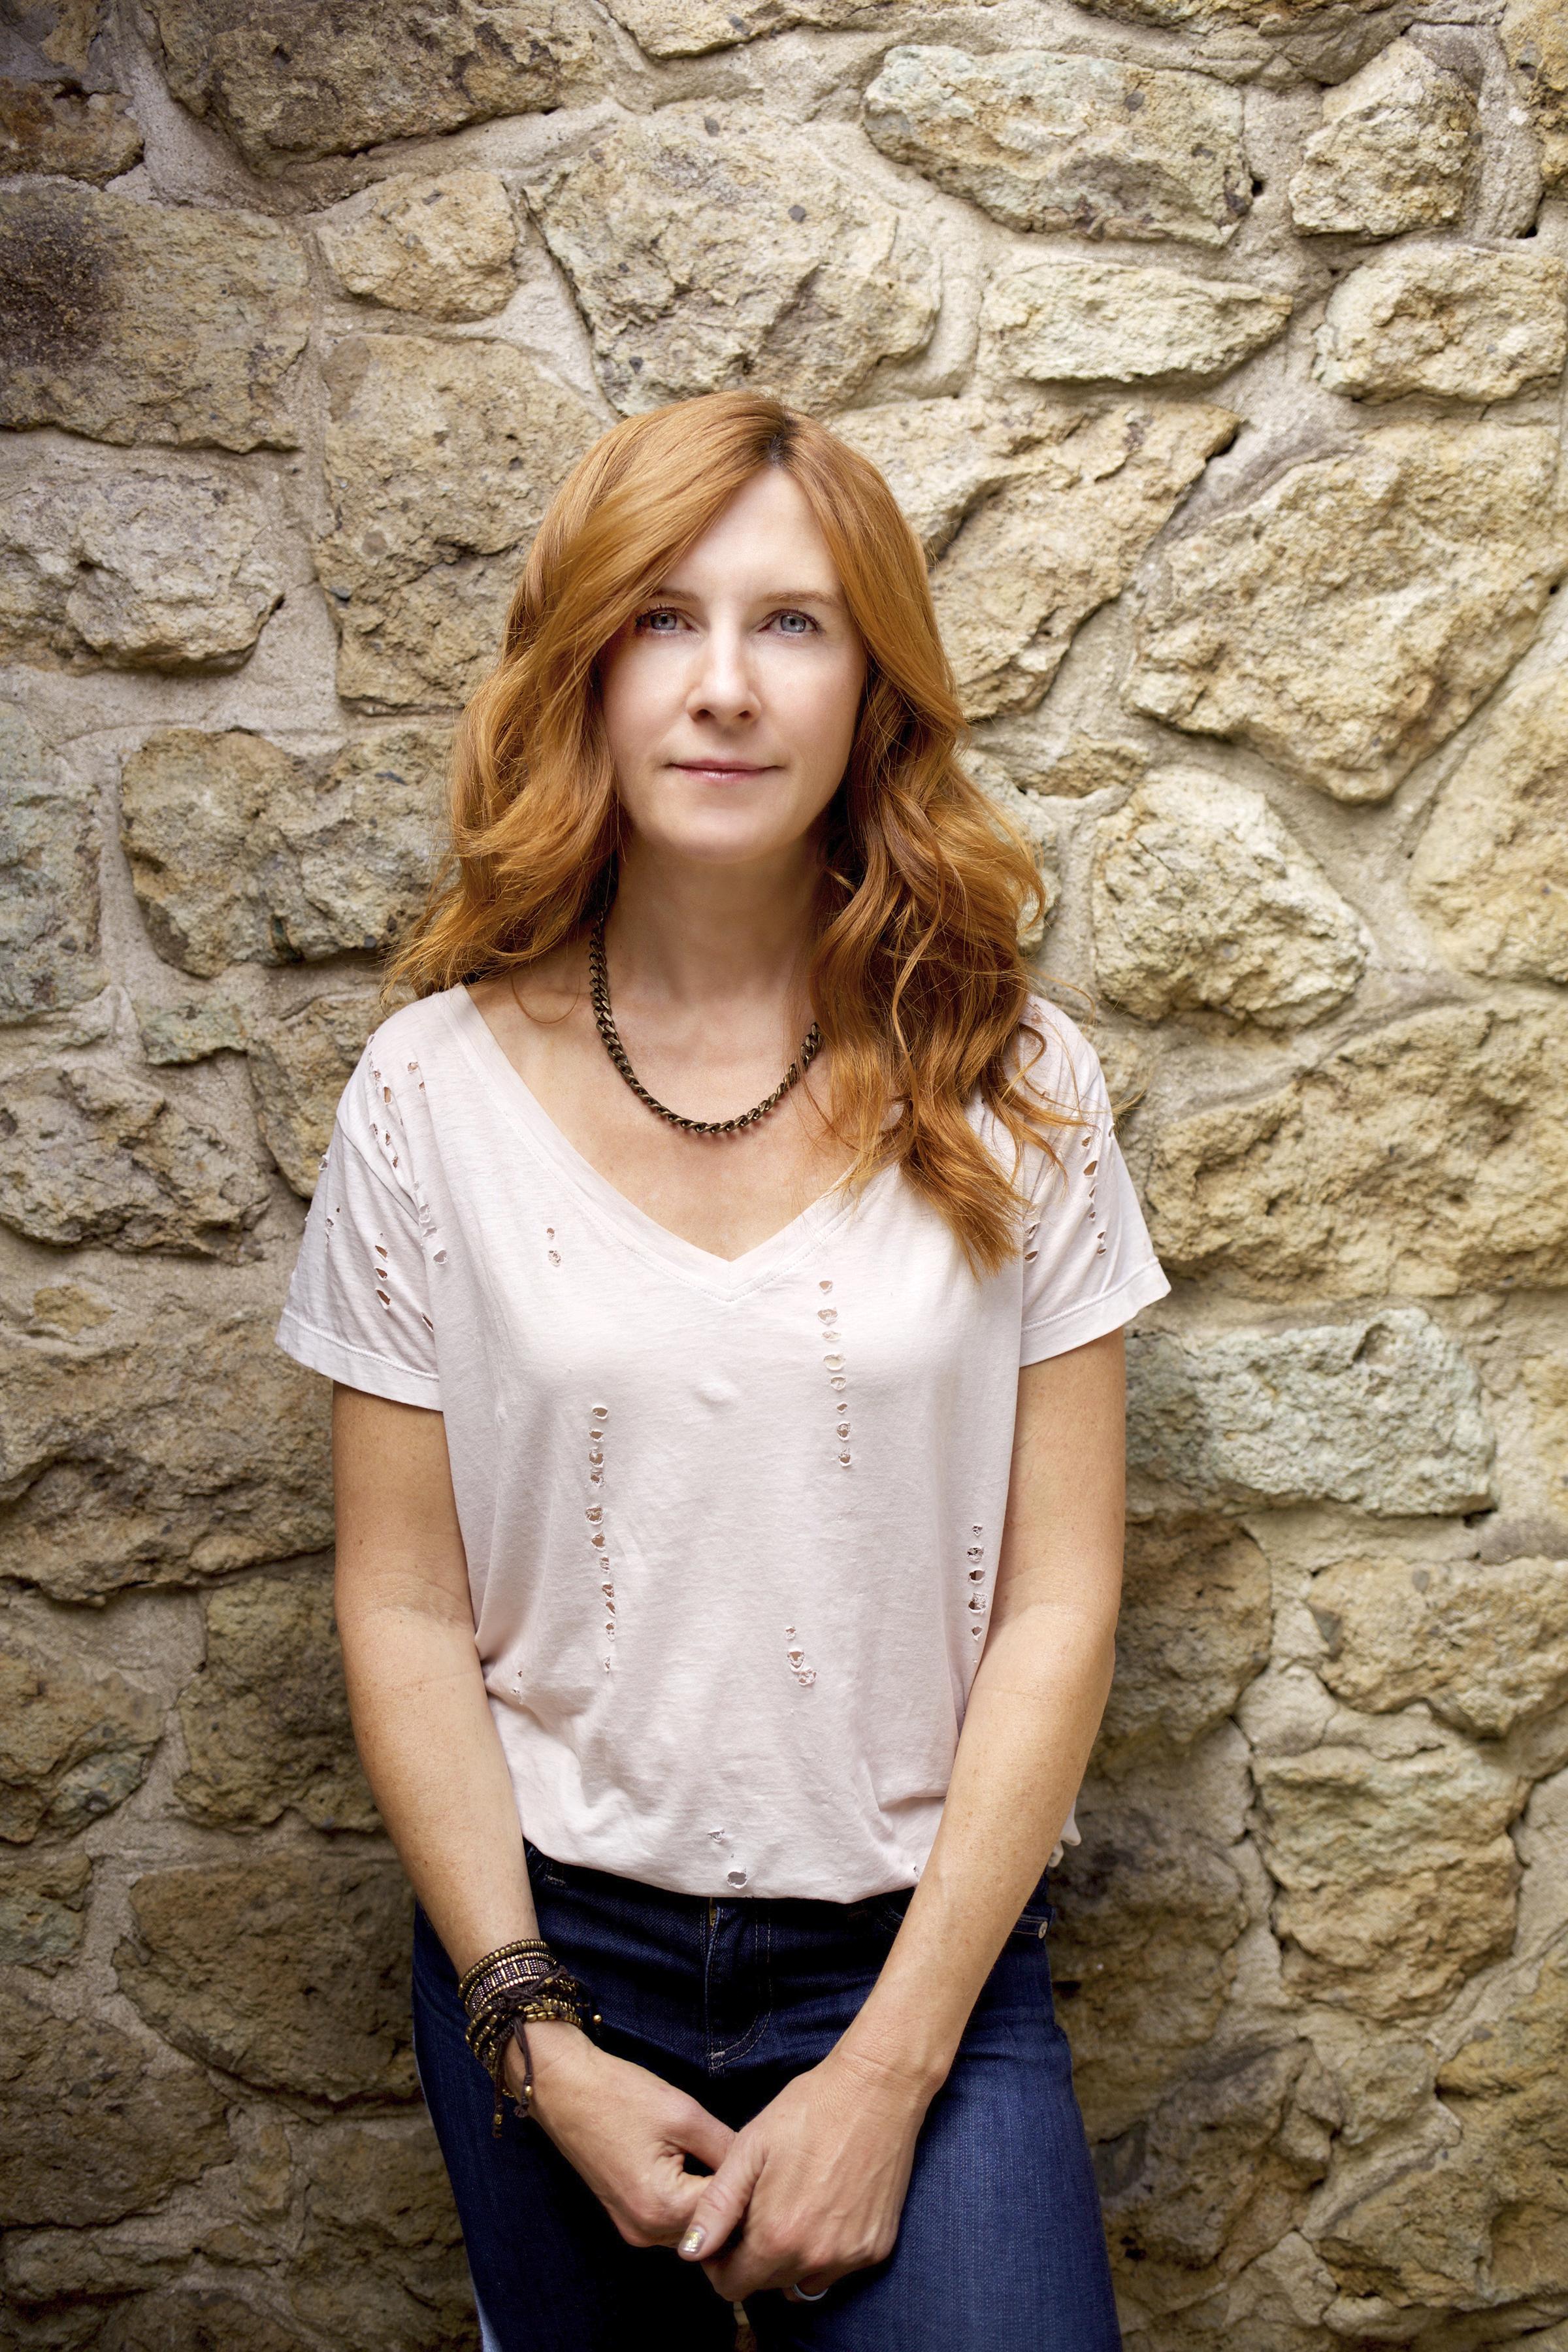 Tabitha Soren, author of